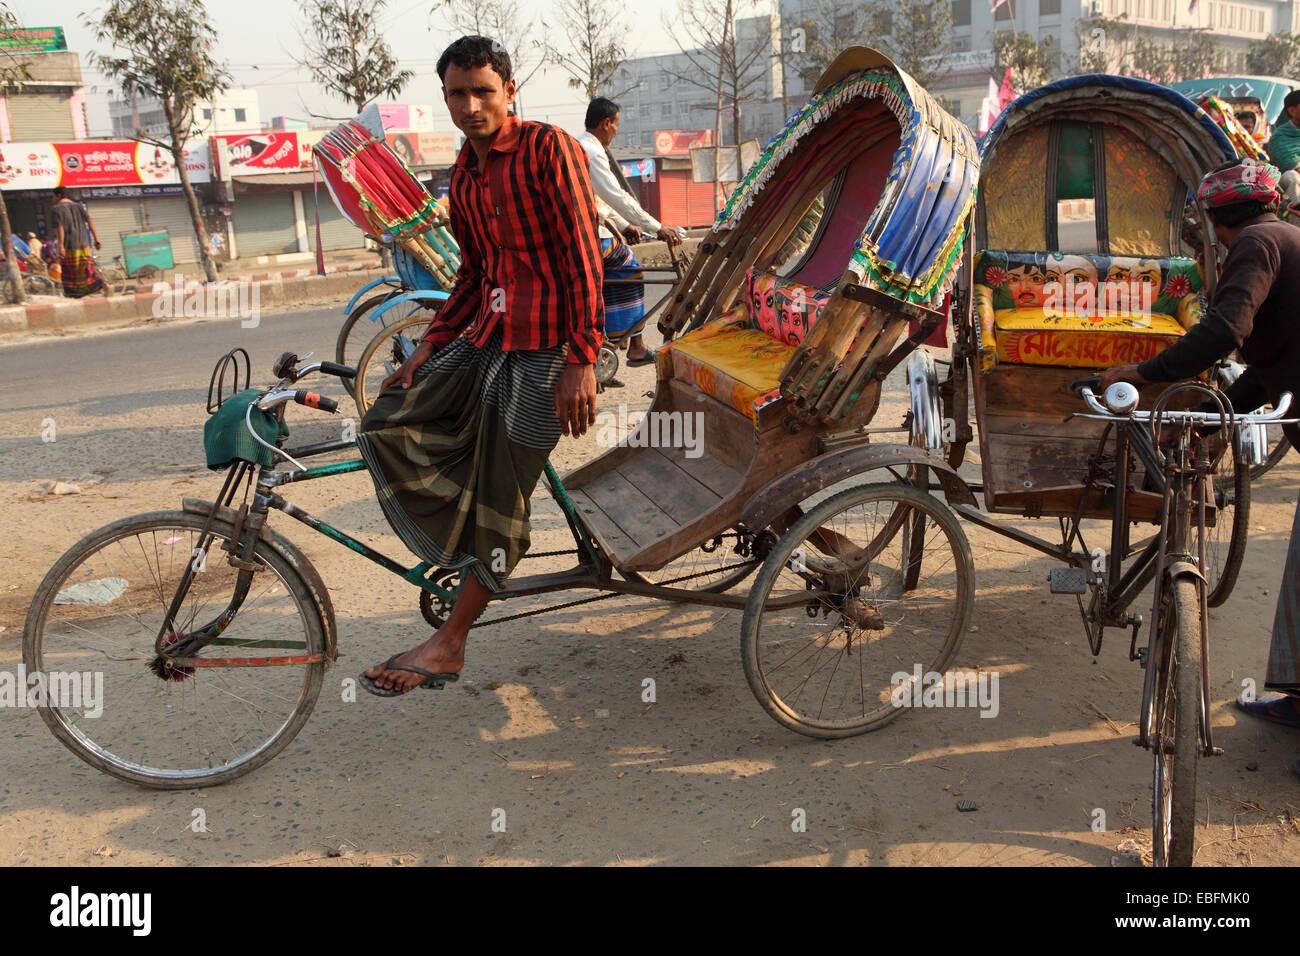 A rickshaw driver in Dhaka, Bangladesh. The city has around 400,000 rickshaws. - Stock Image